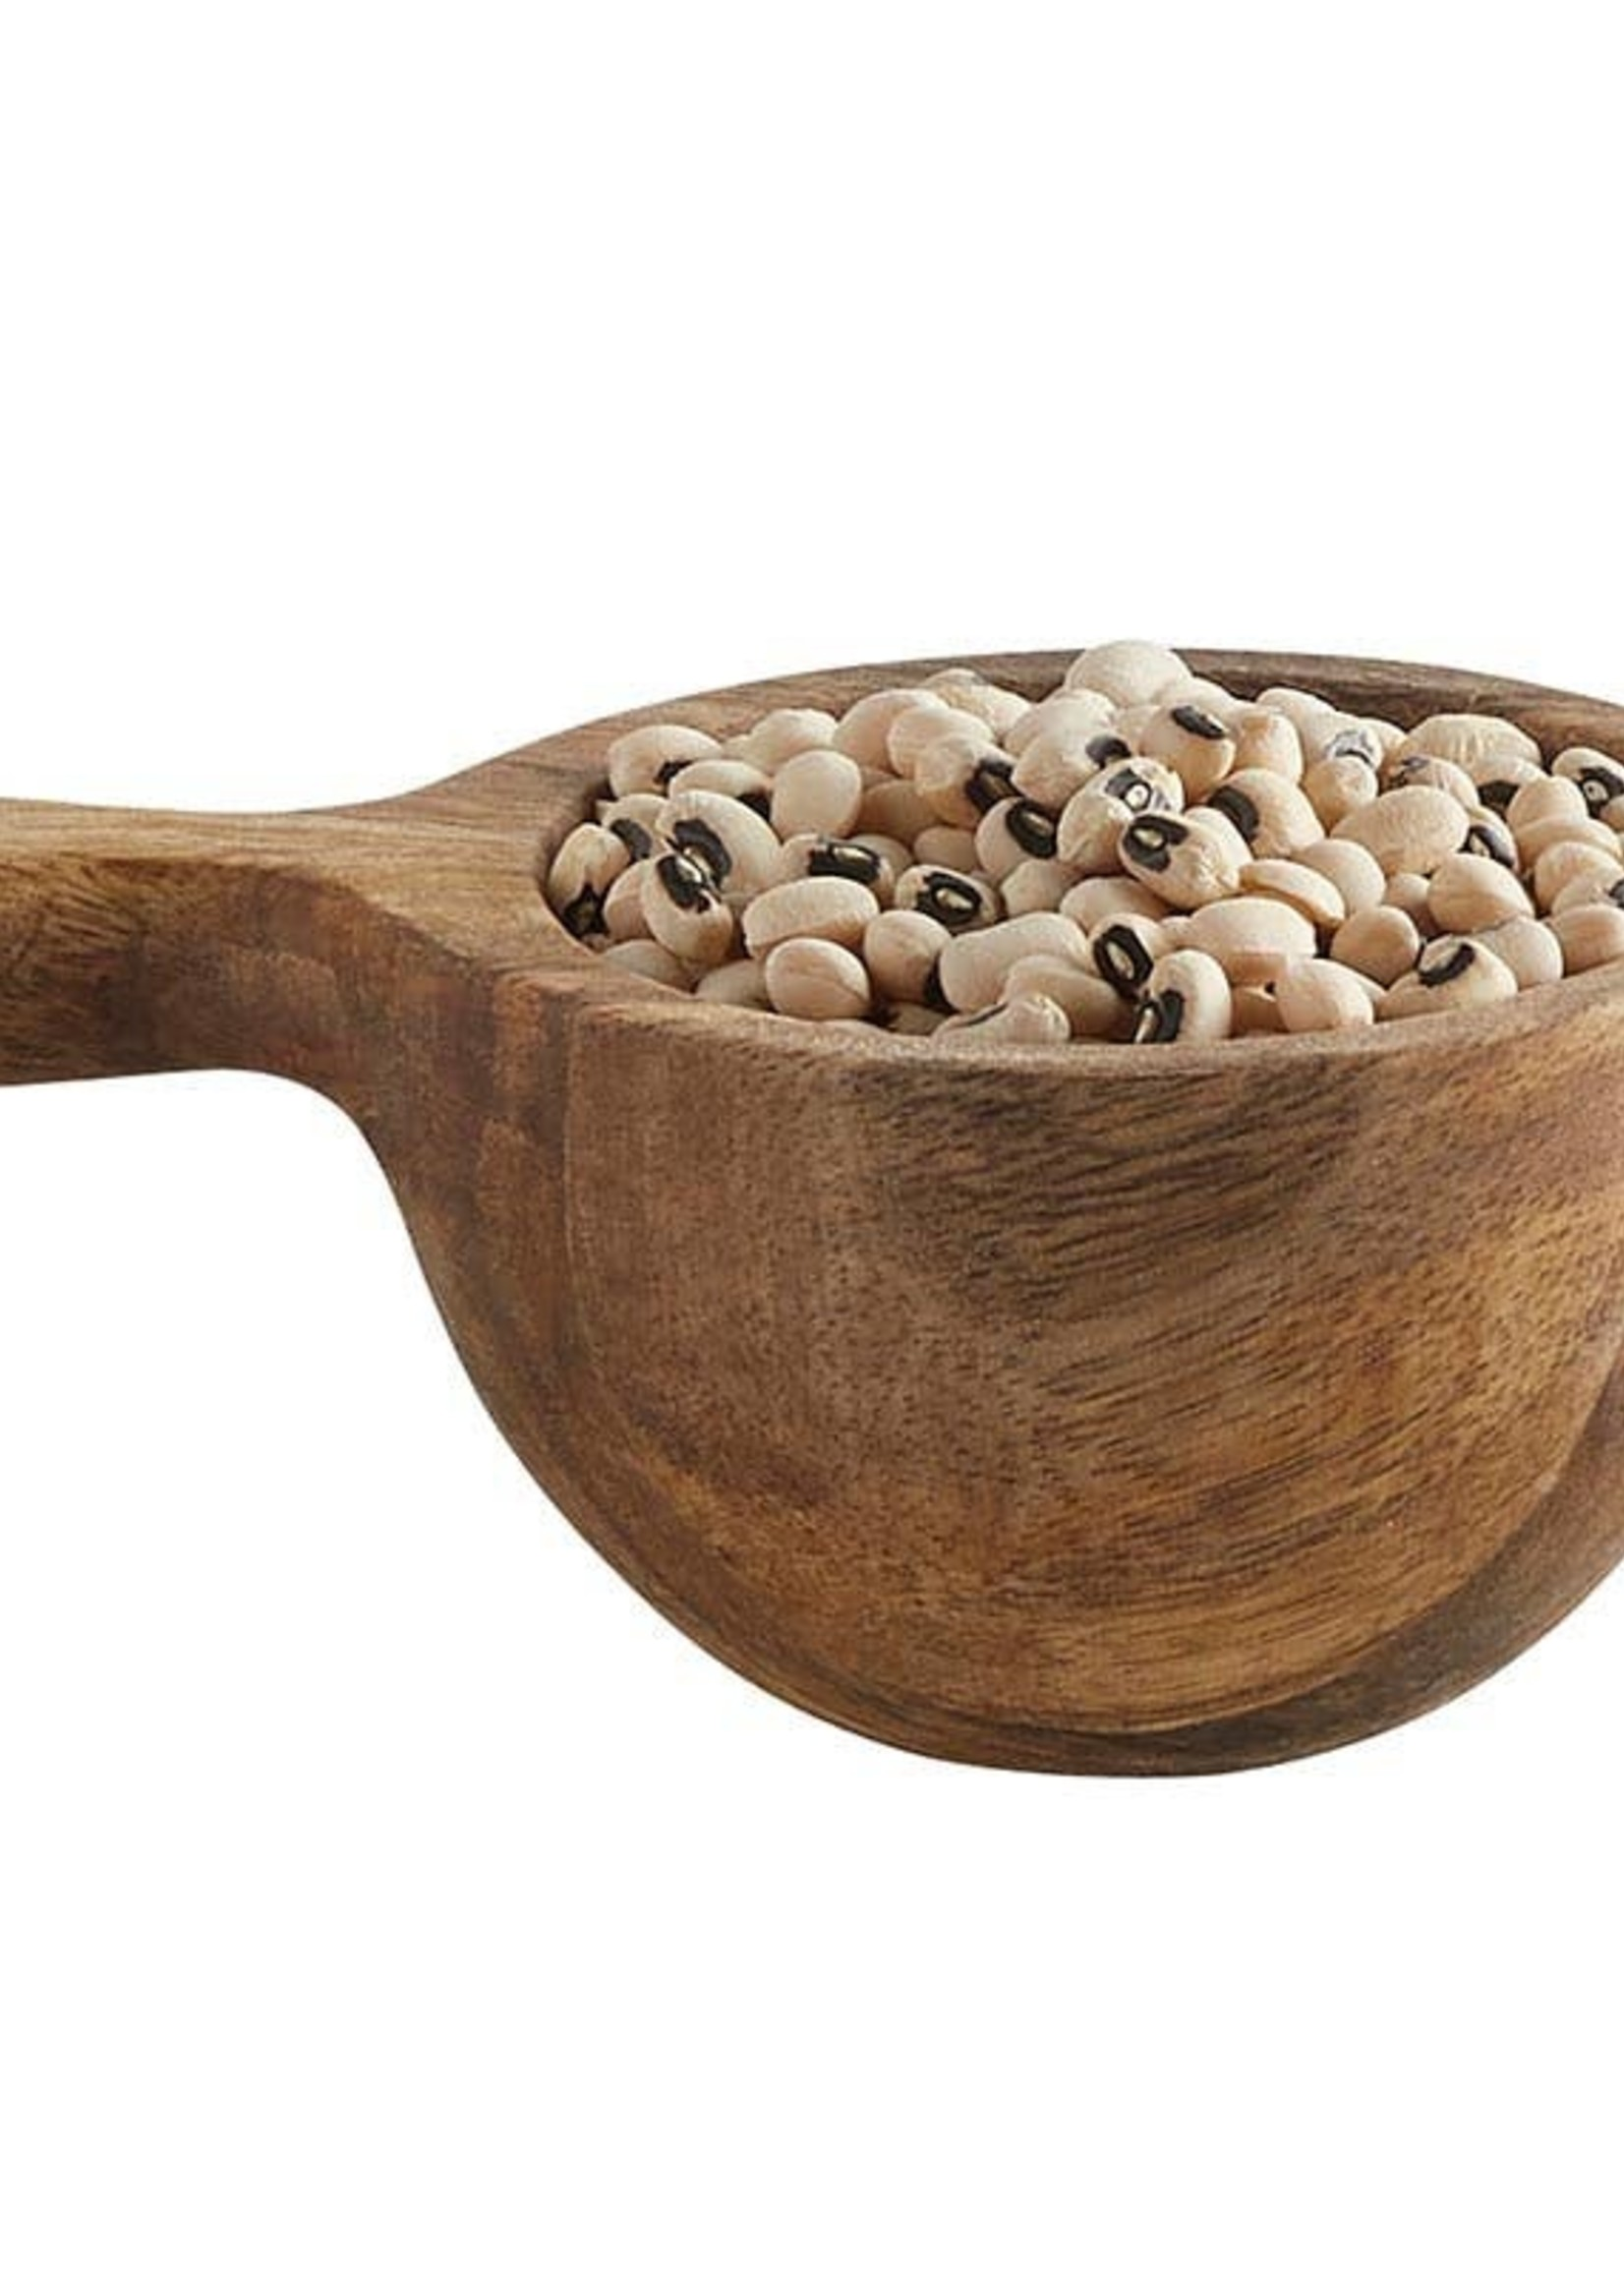 Wooden Spoon Md